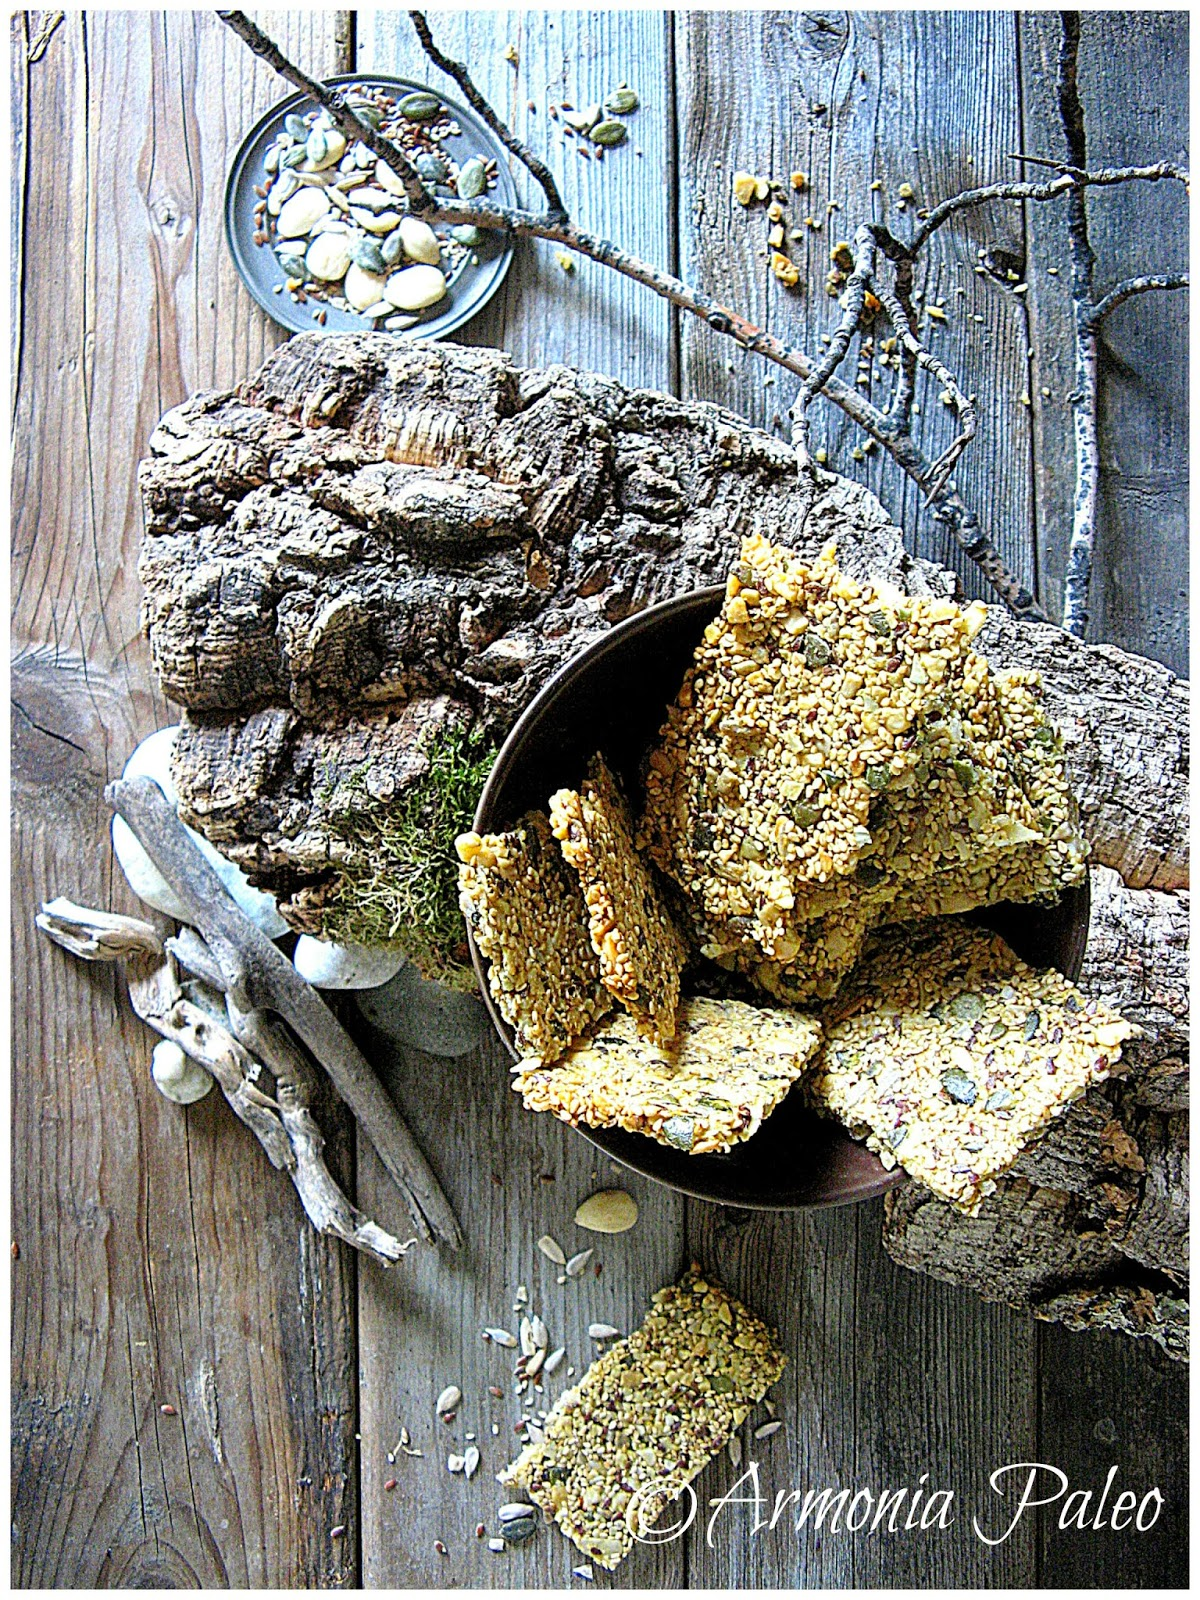 Knäckebröd - Paleo Pane Croccante Svedese di Armonia Paleo